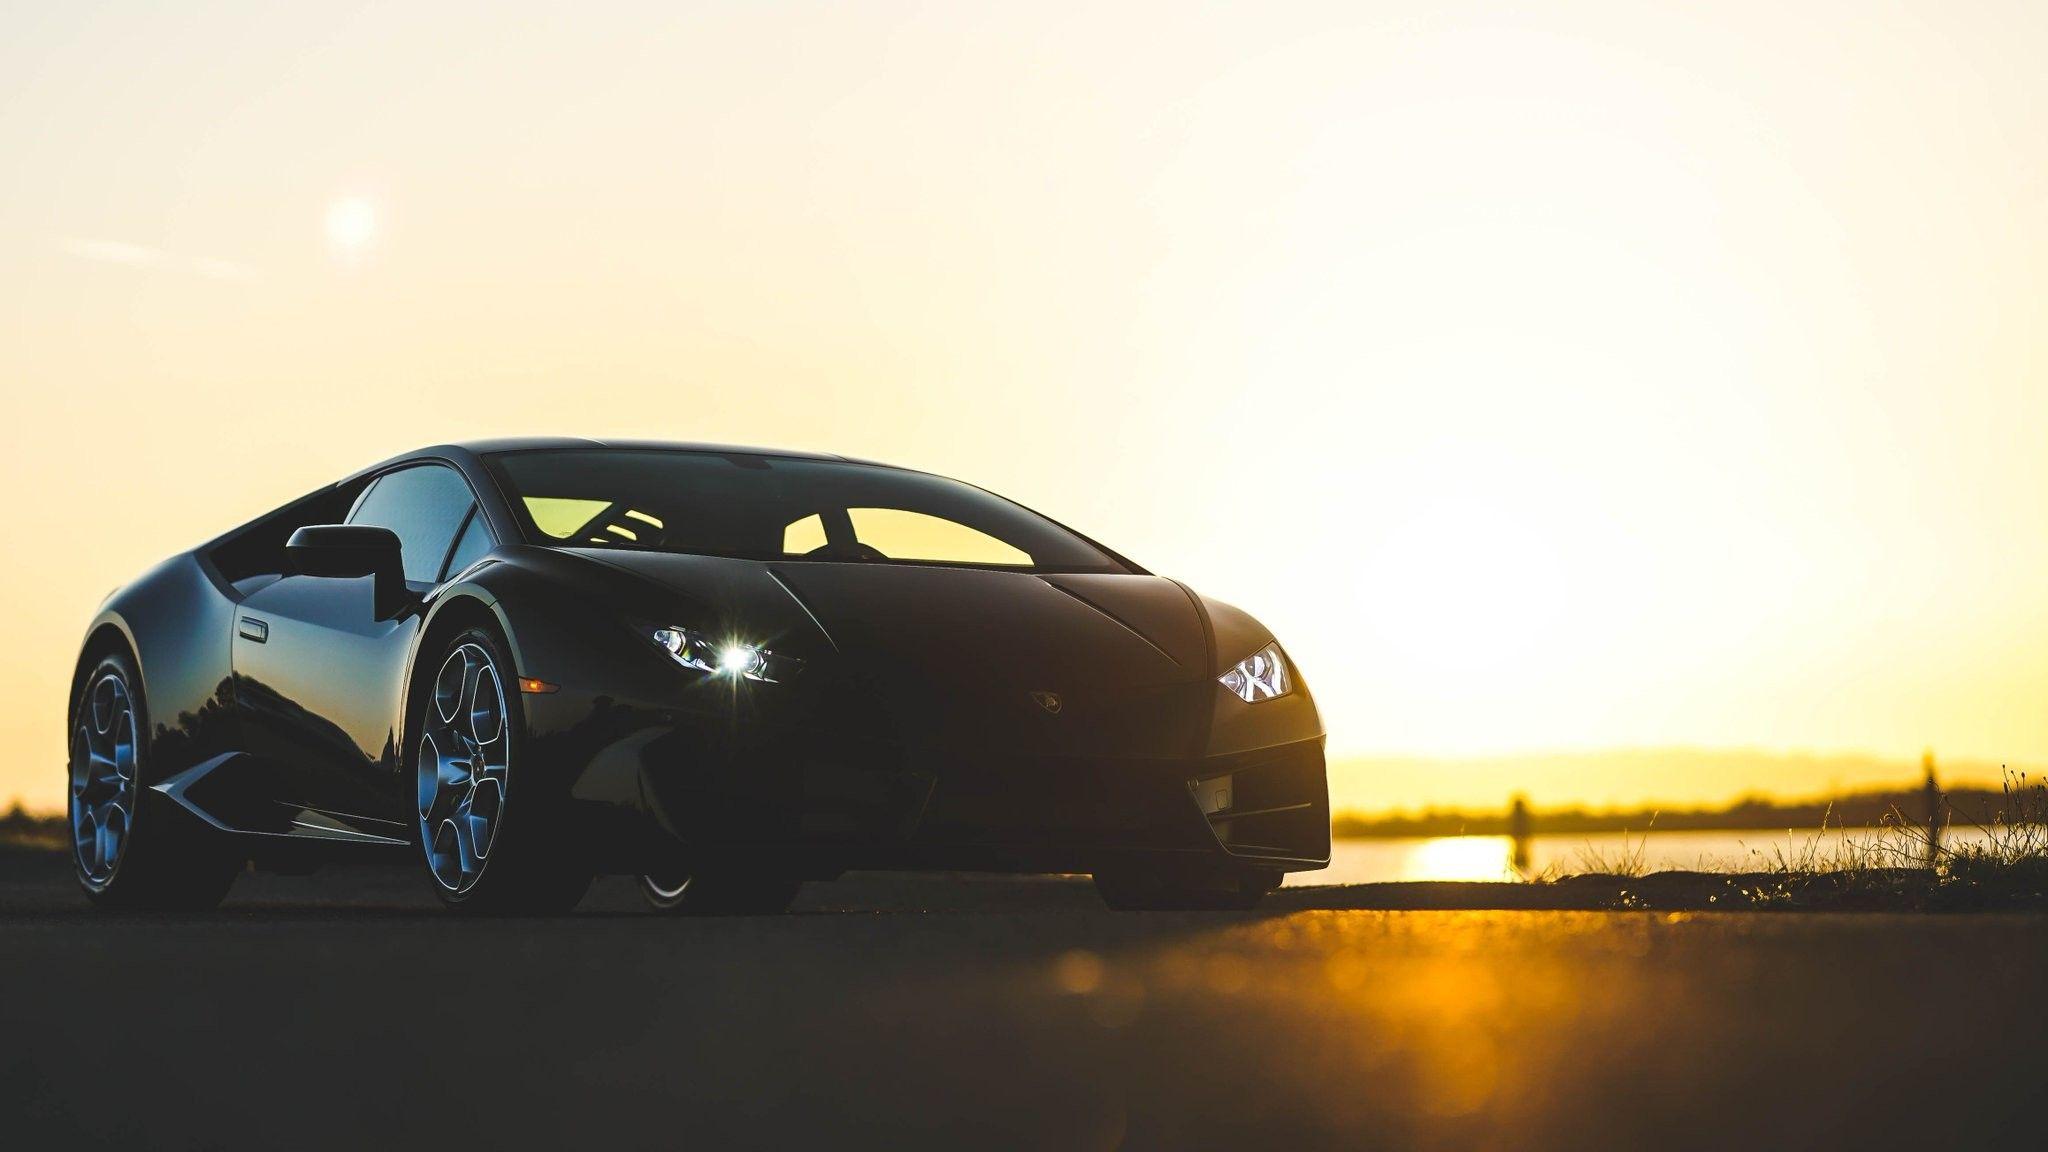 Pin By El Dorado On Lamborghini World With Images Super Cars European Cars Cars